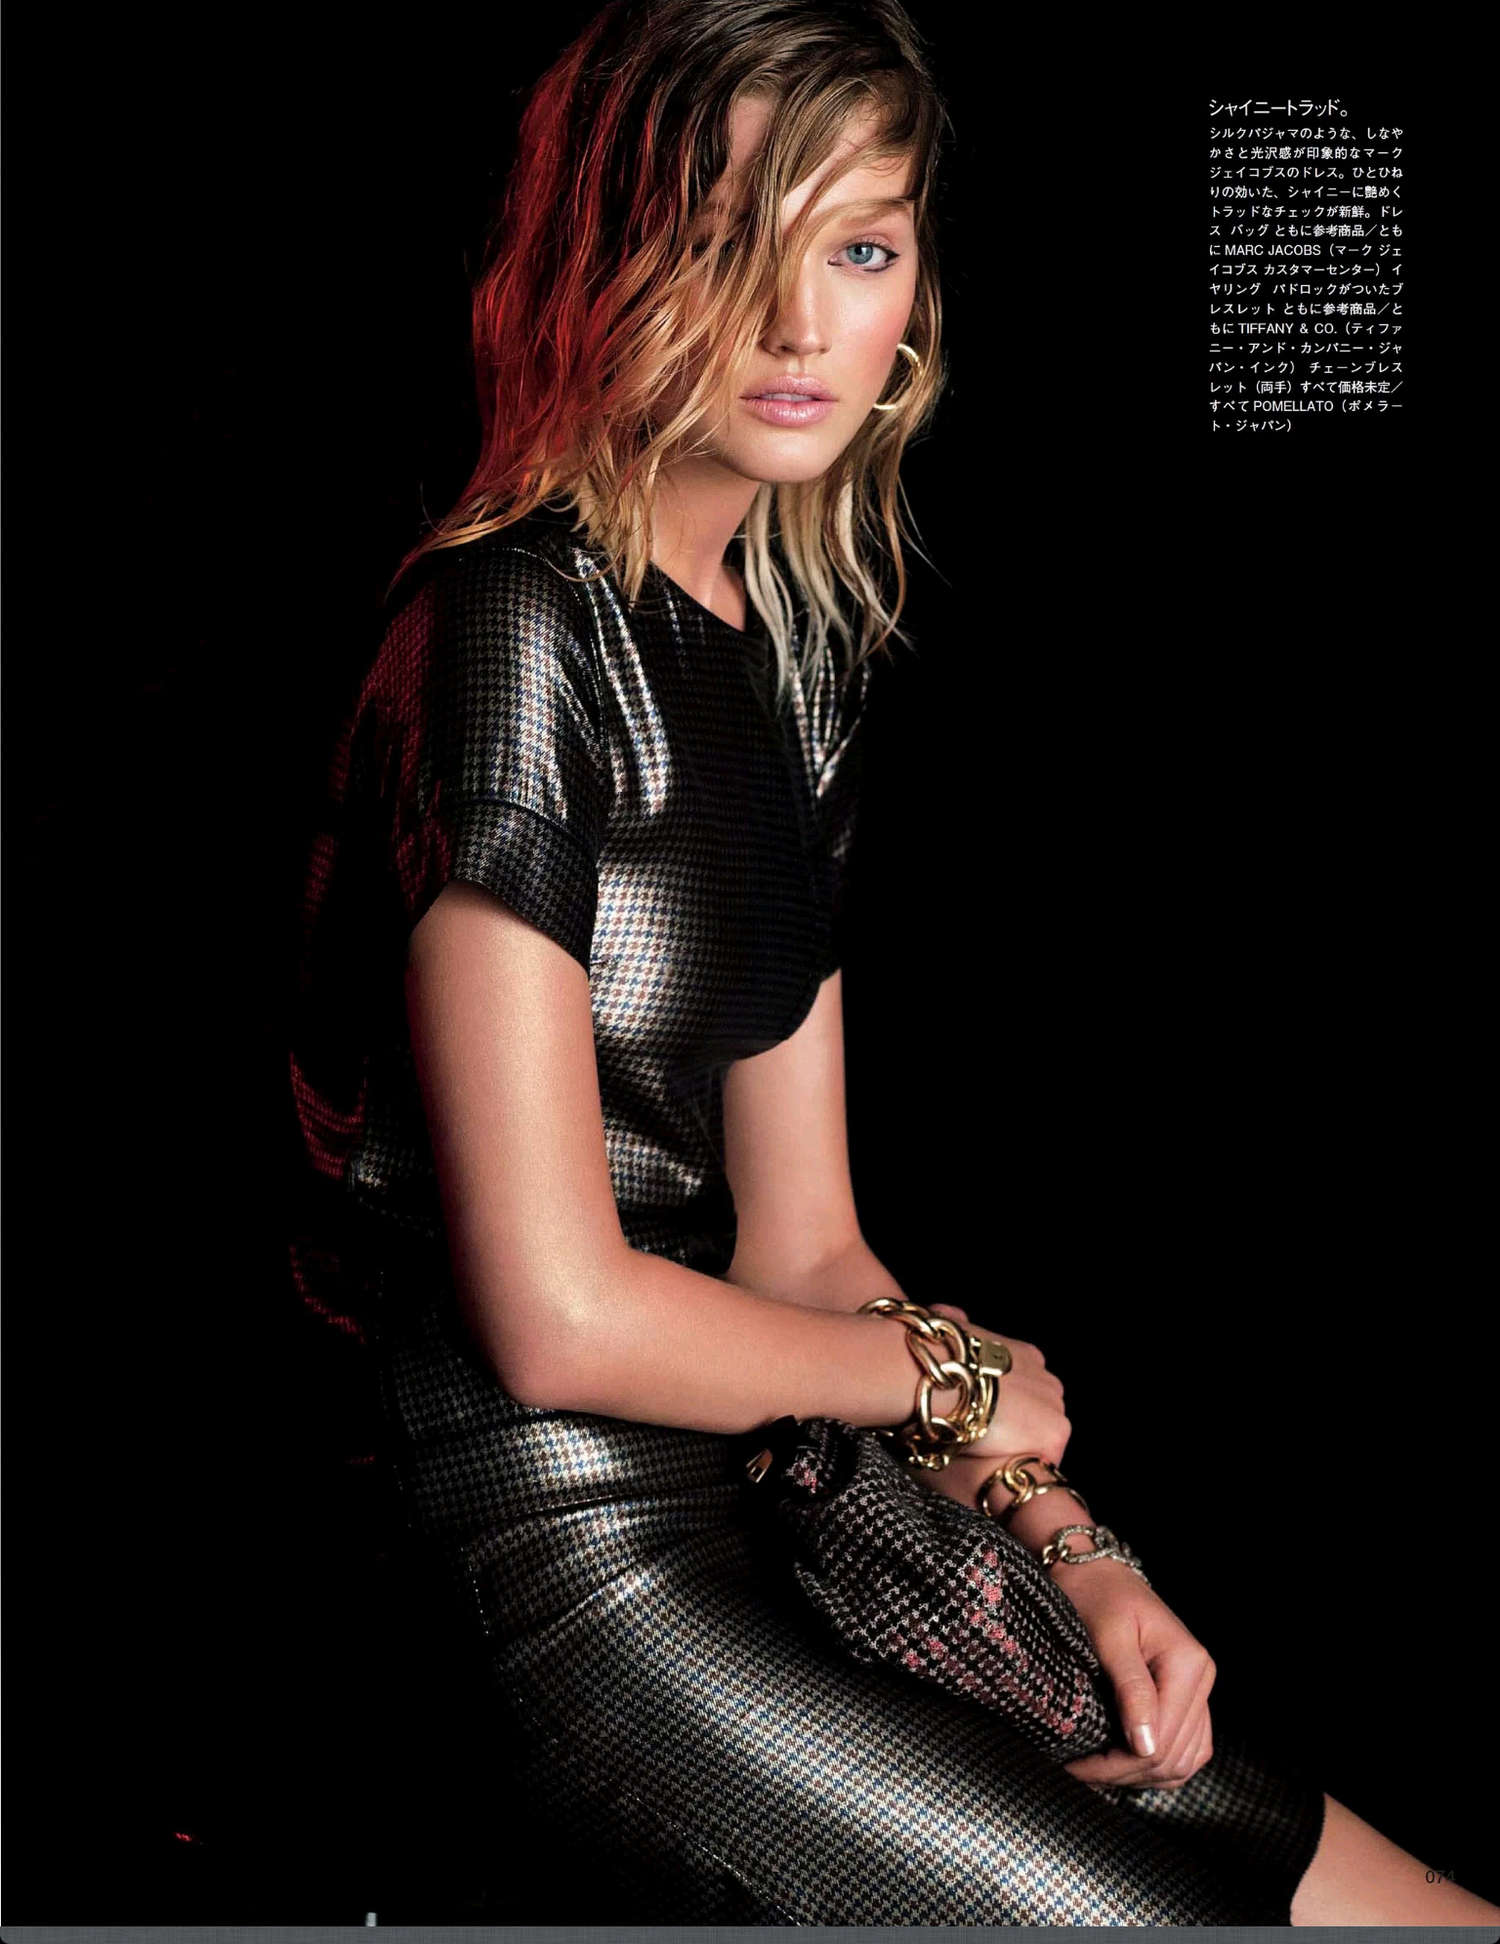 Toni Garrn Vogue Japan August 2013 11 Gotceleb